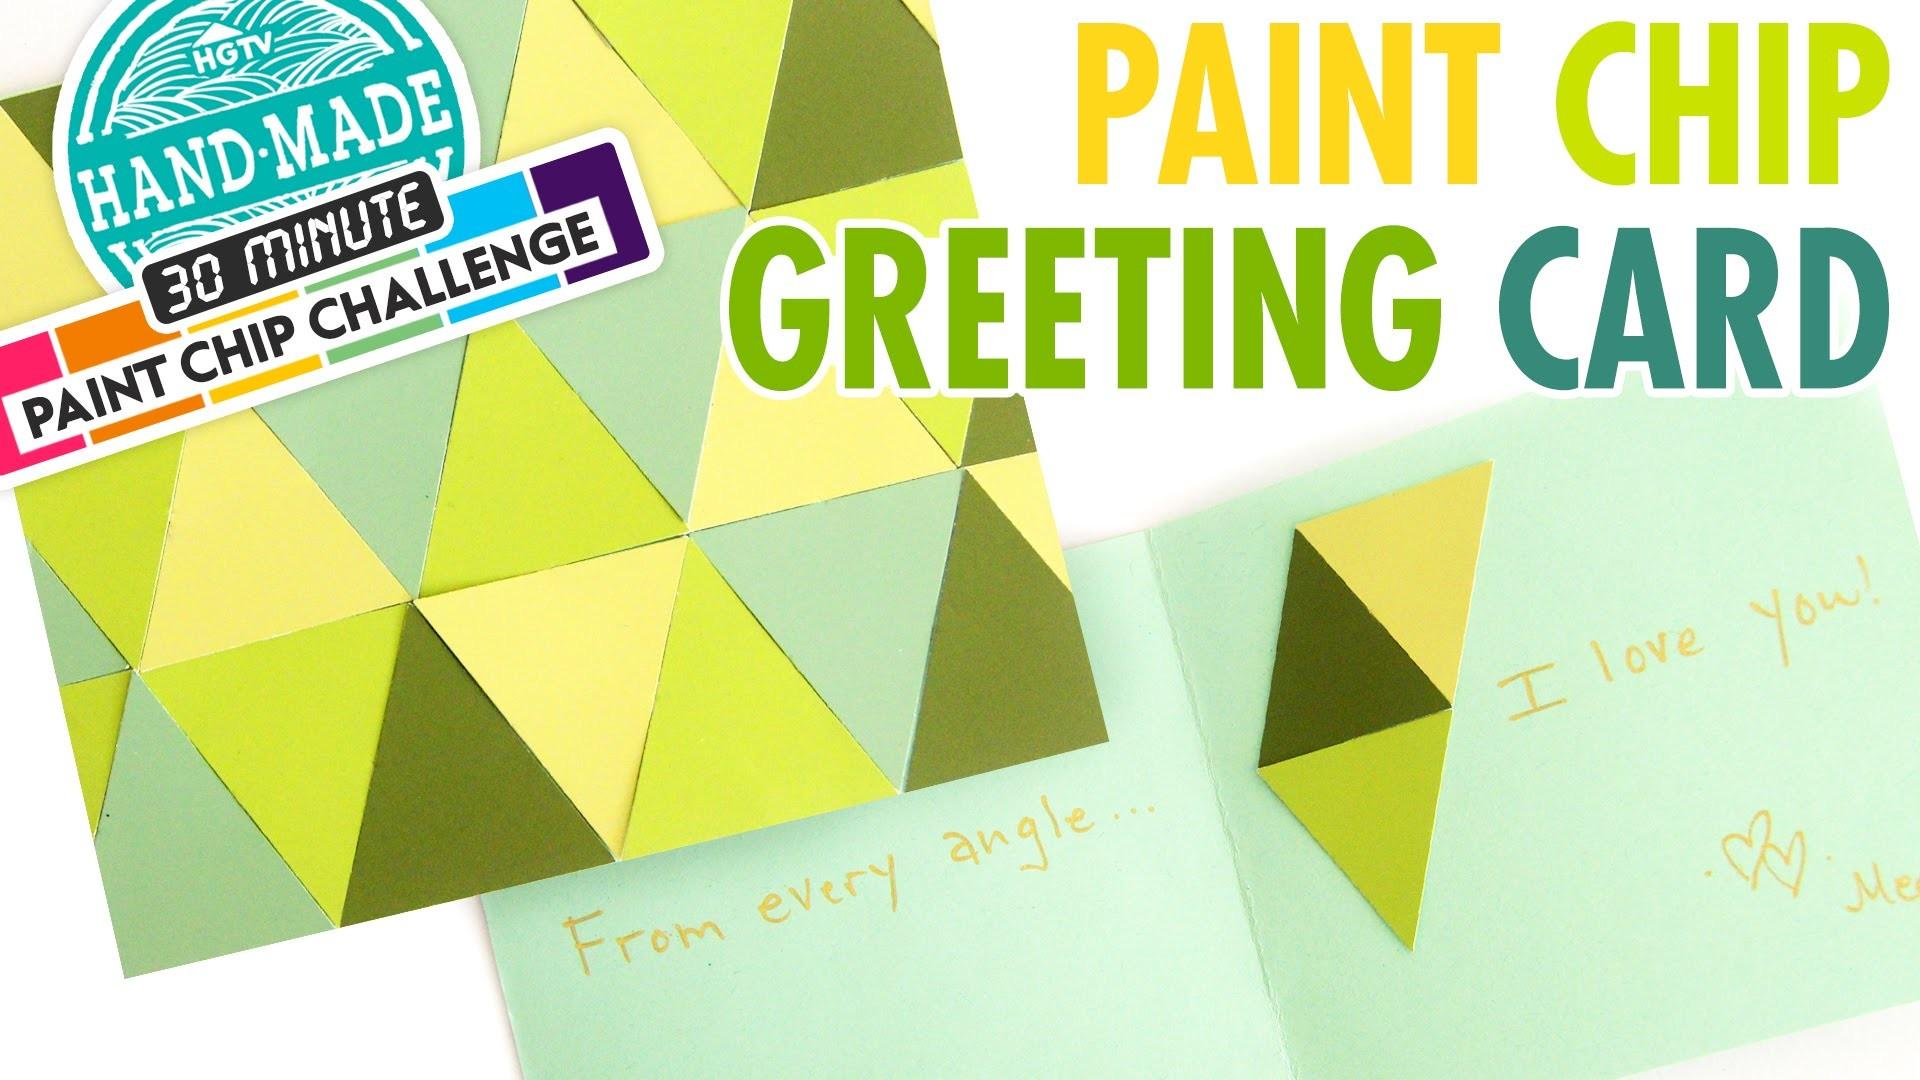 DIY Paint Chip Greeting Card - Meg's 30 Minute Craft Challenge - HGTV Handmade